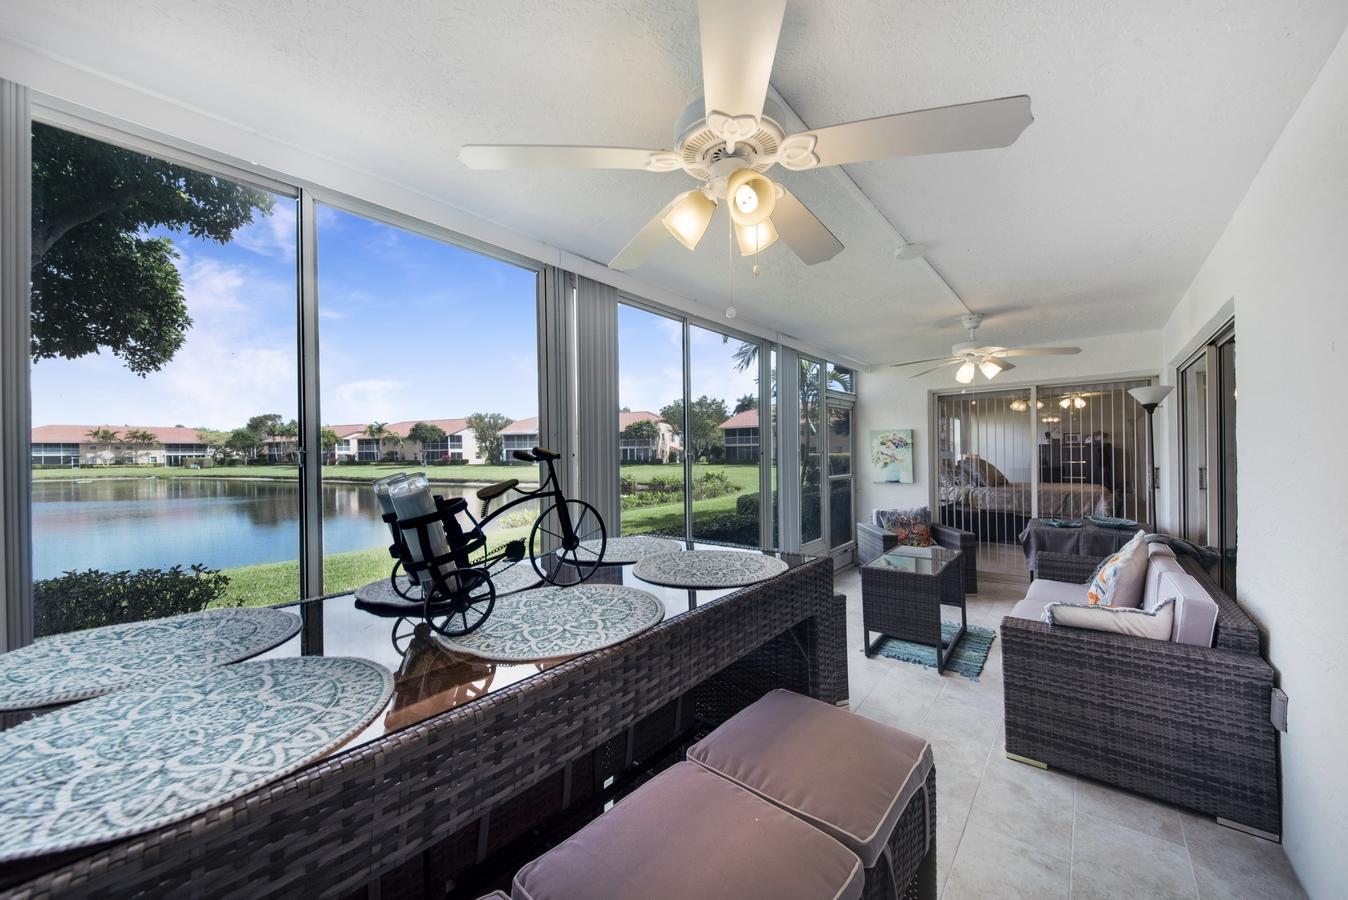 9985 Harbour Lake Circle 101  Boynton Beach, FL 33437